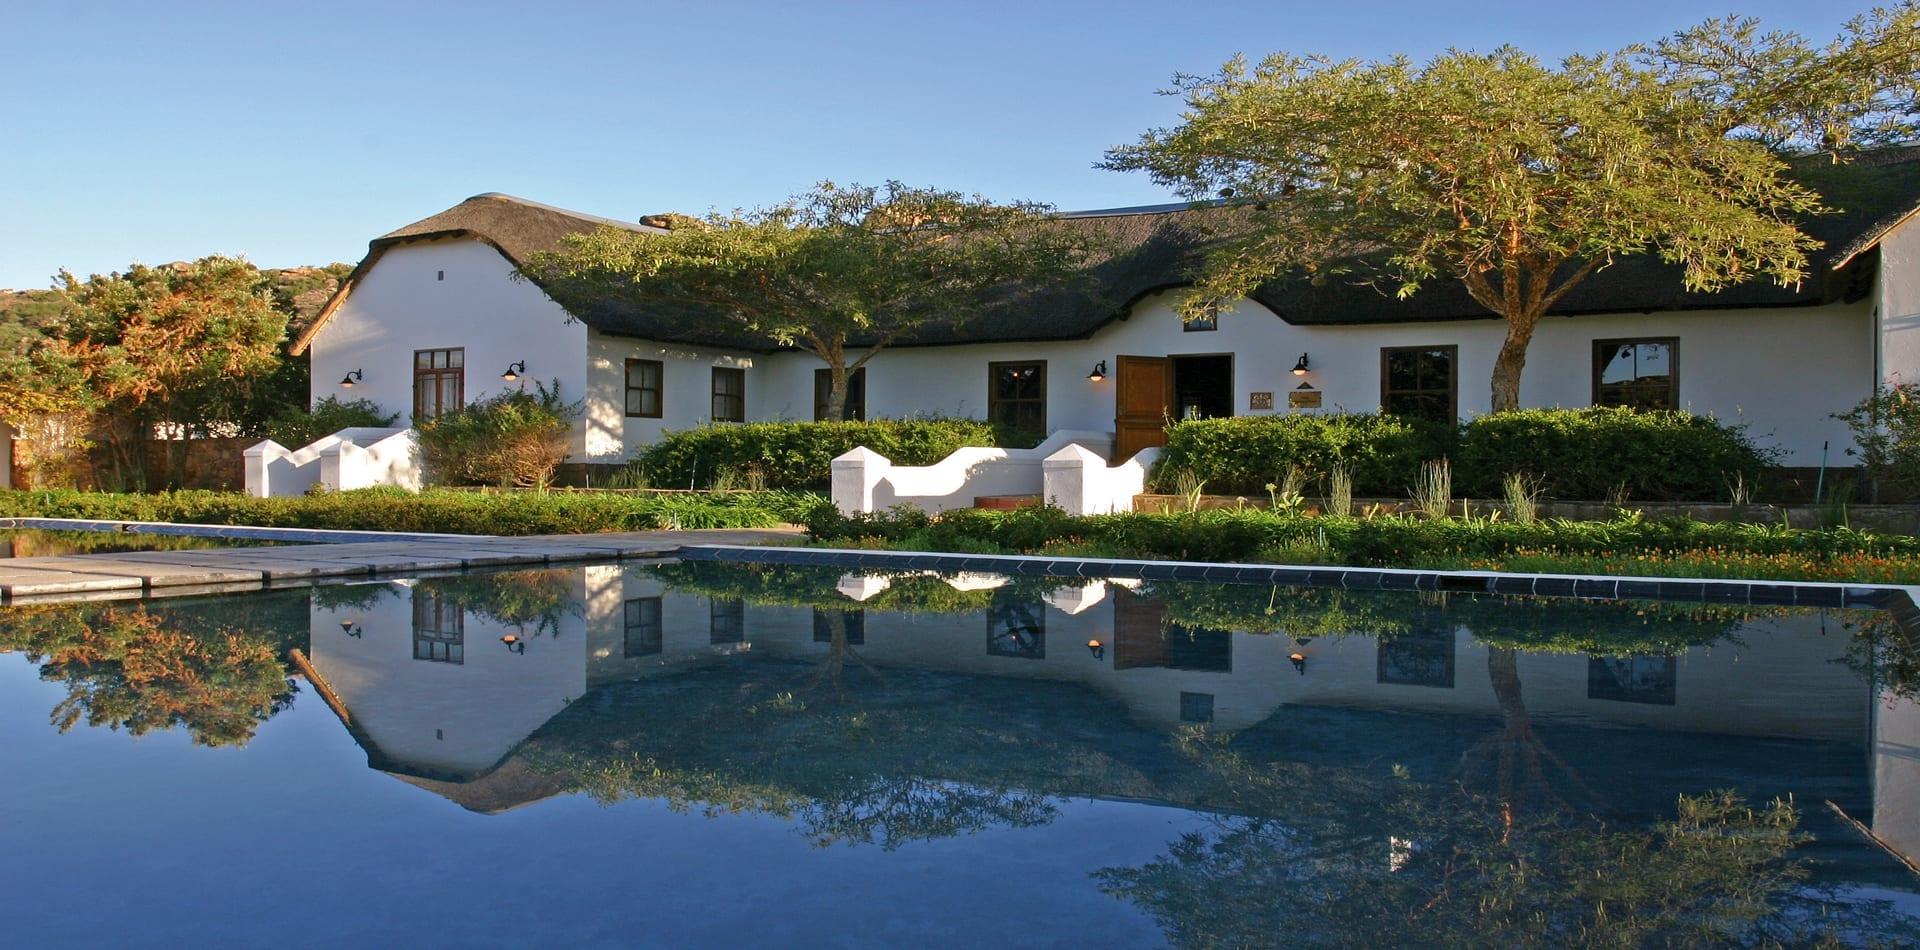 HERO South Africa Bushmans Kloof Homestead